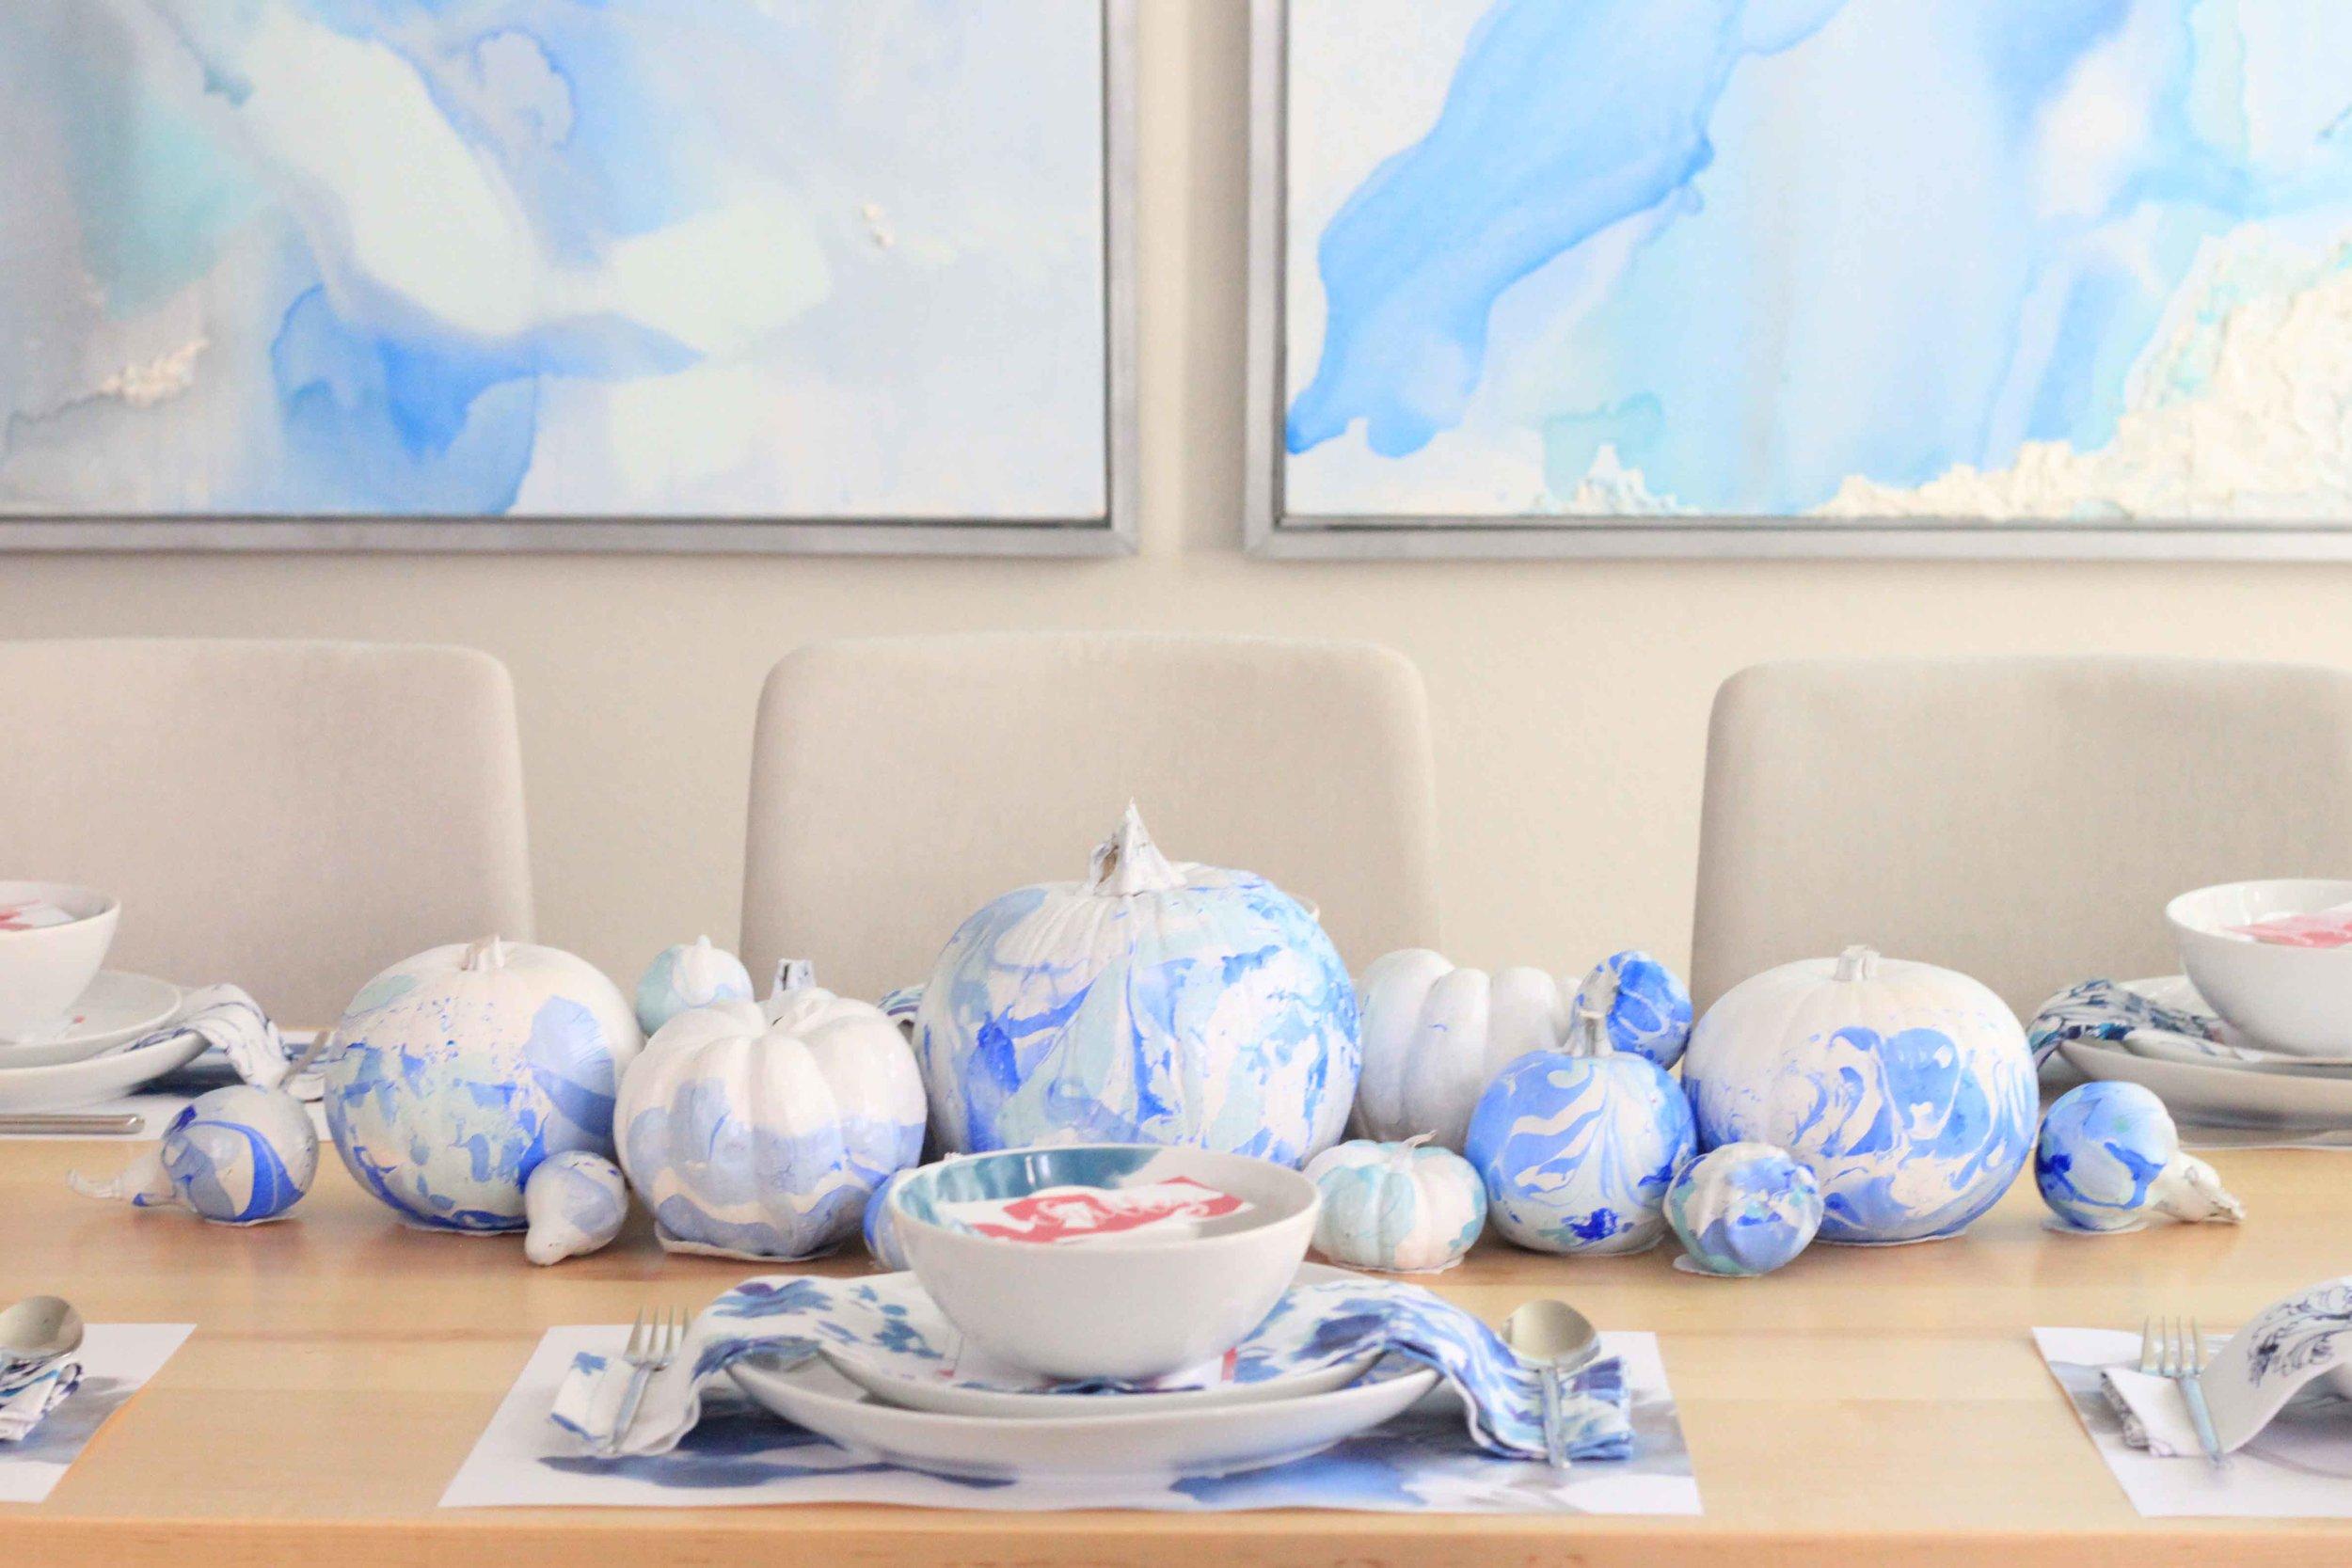 marbled pumpkin chinoiserie table setting thanksgiving DIY table decor tutorial (charisma shah)